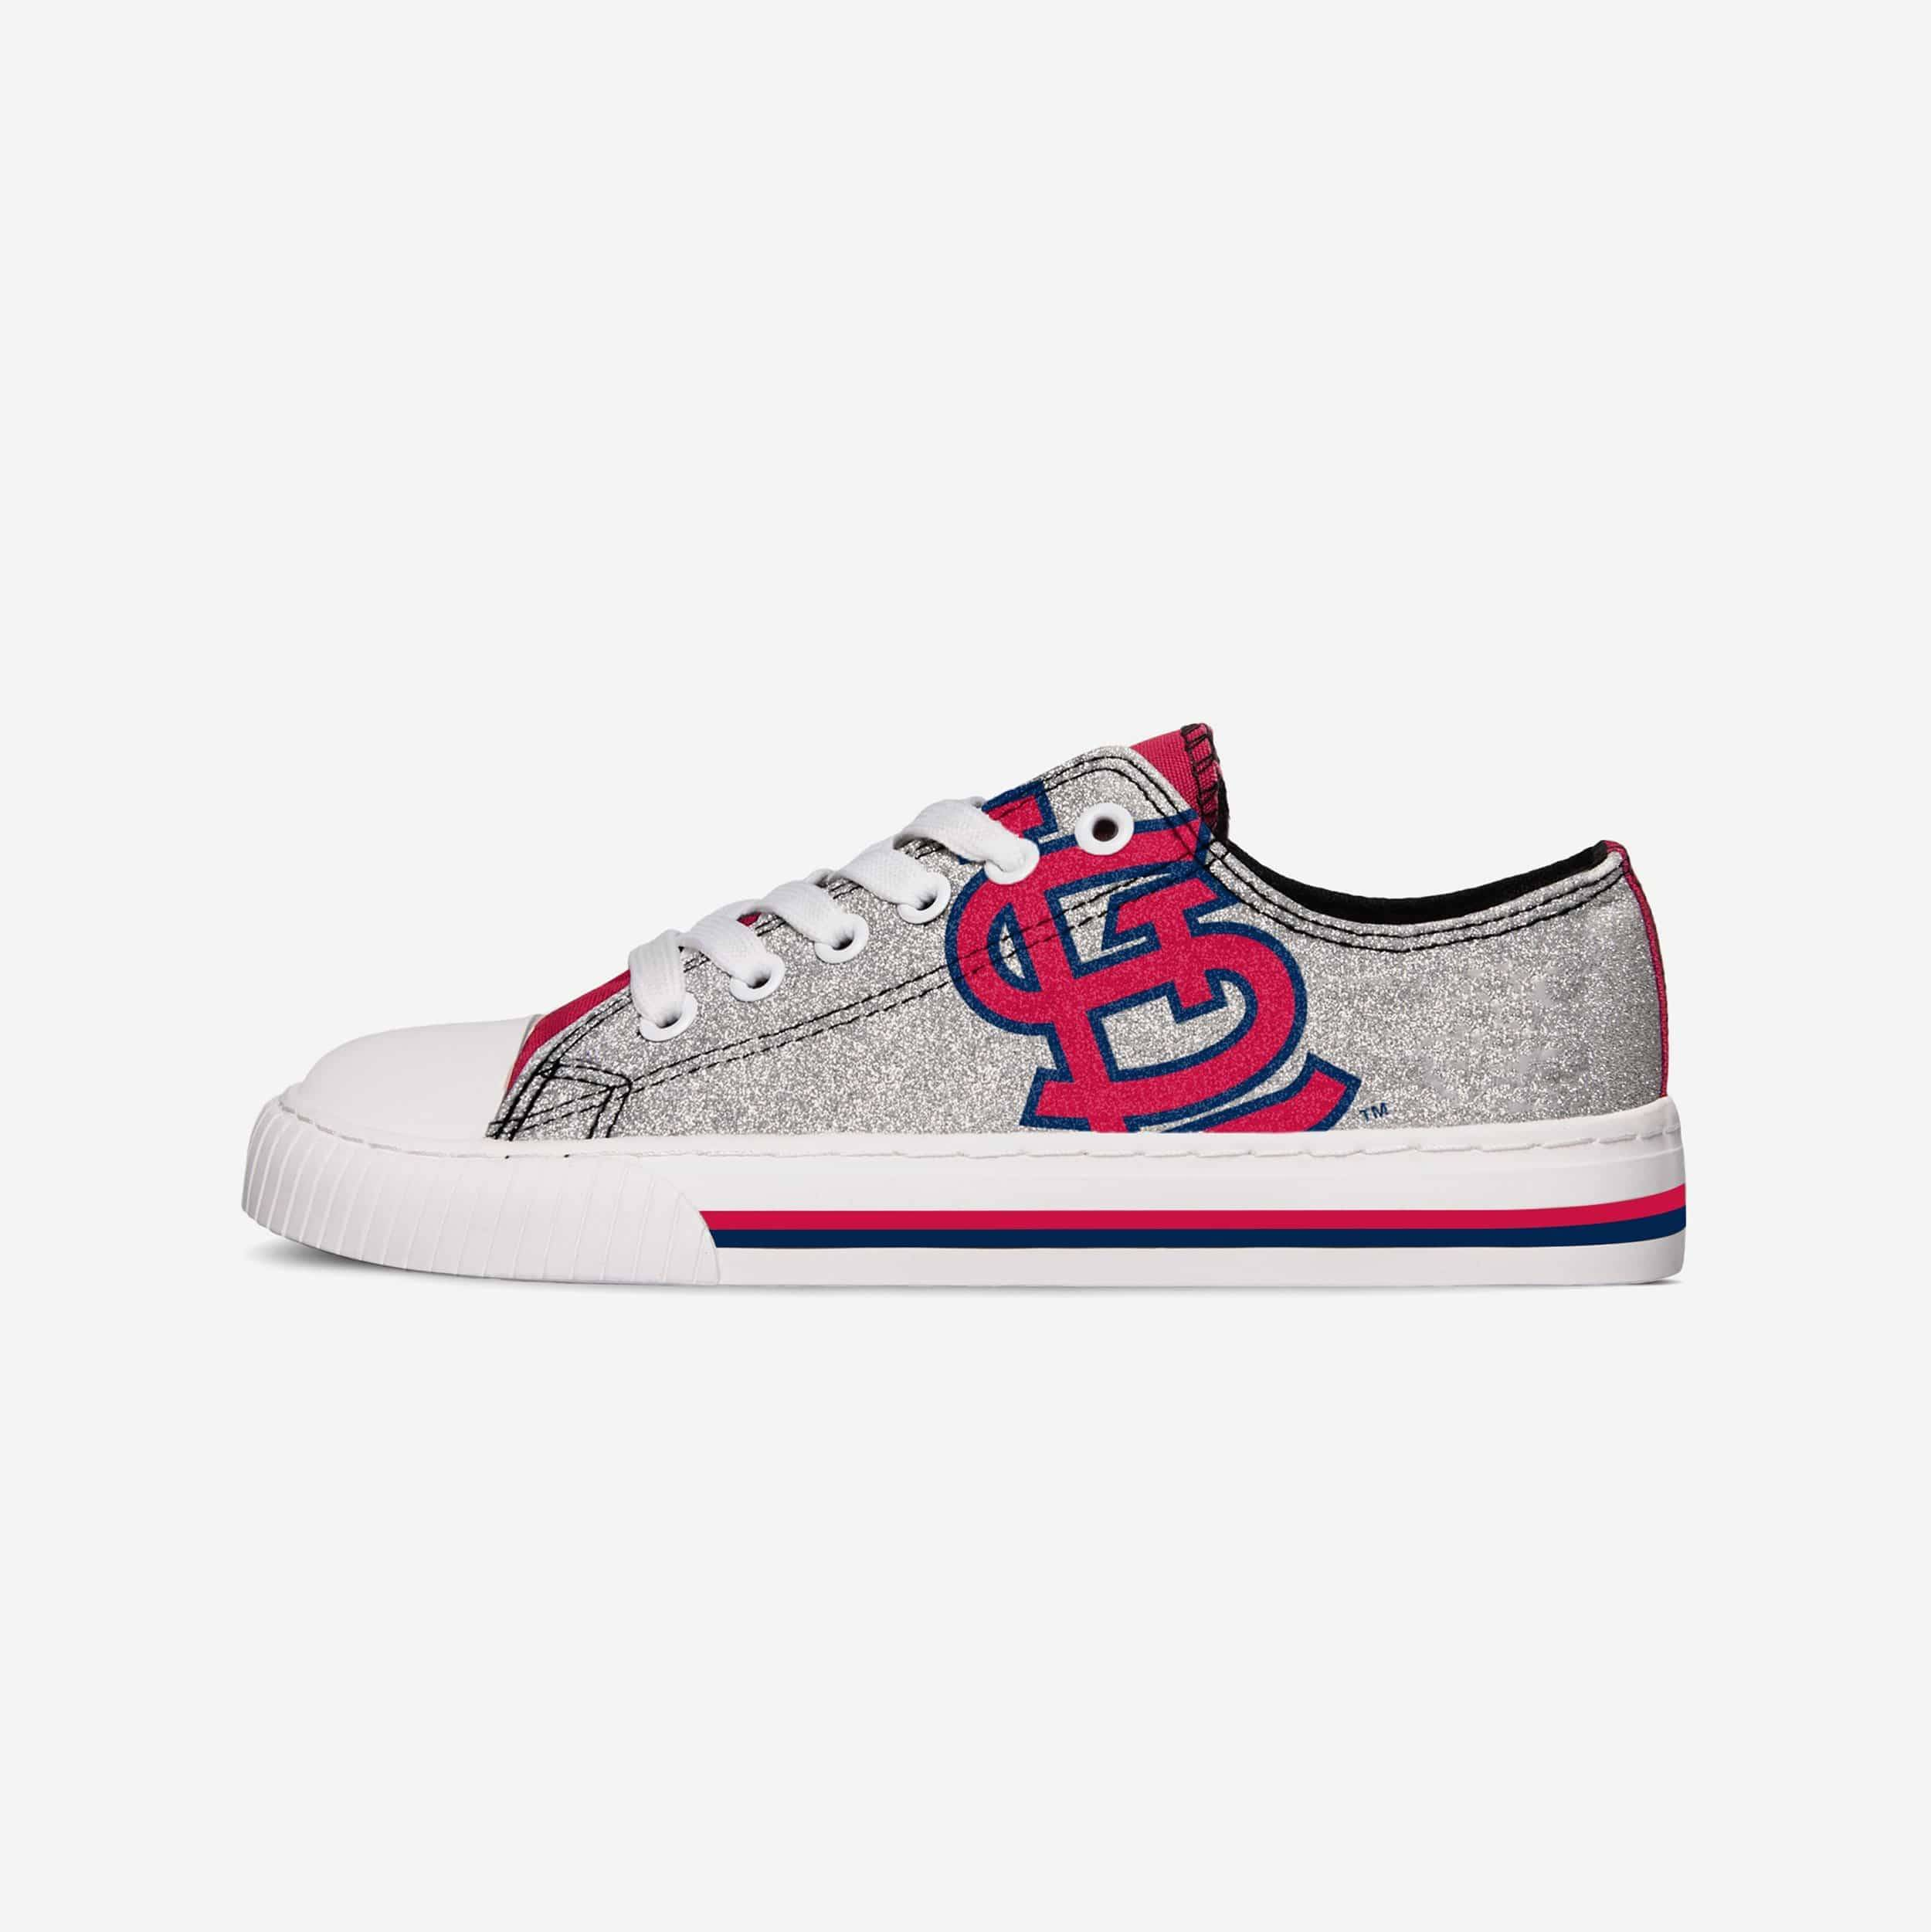 FOCO St Louis Cardinals Womens Glitter Low Top Canvas Shoes - 7